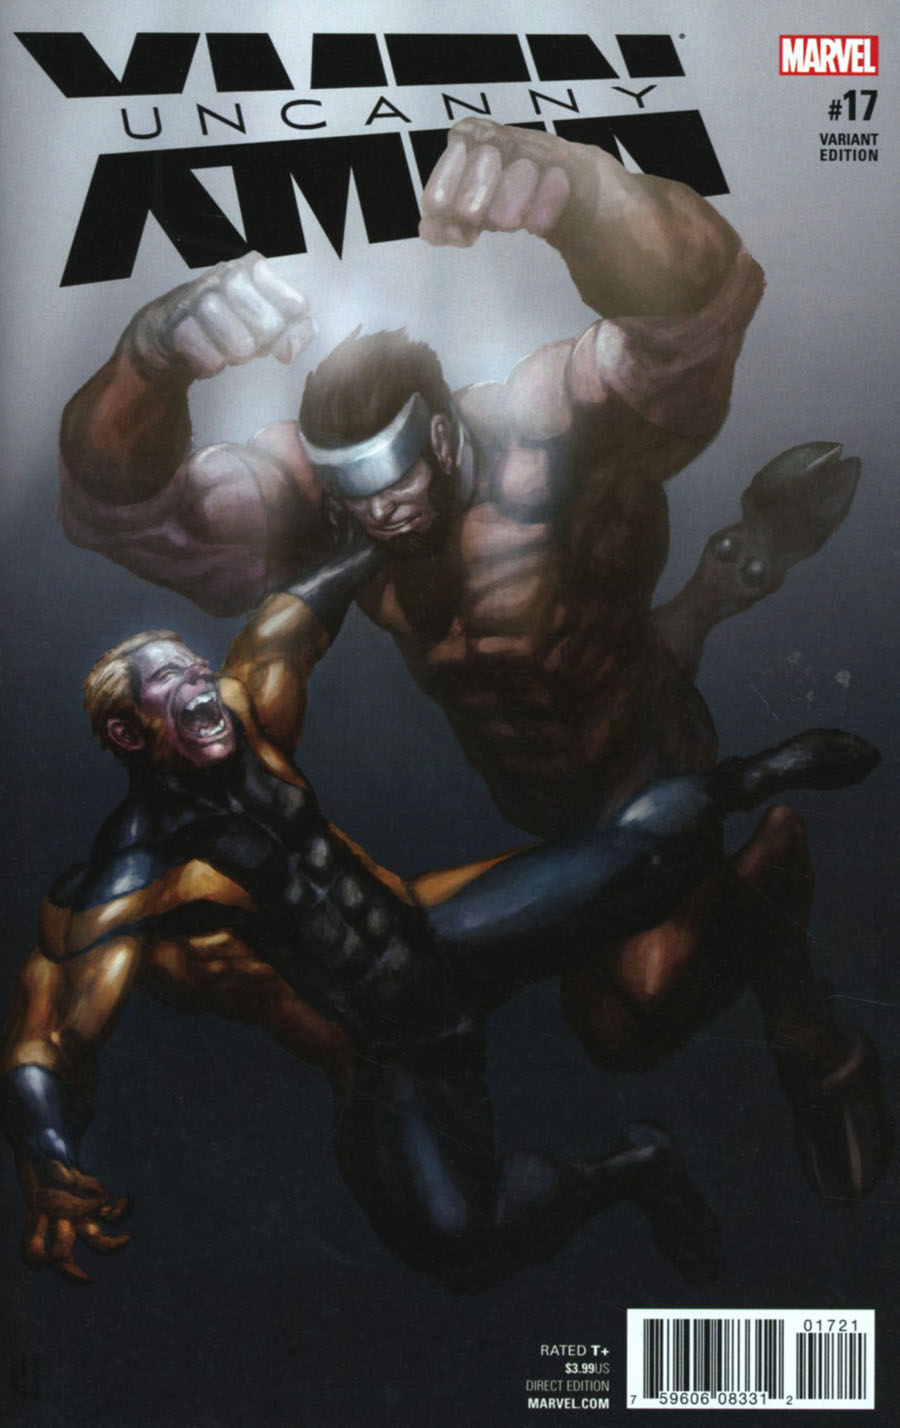 Uncanny X-Men Vol 4 #17 Cover B Incentive Variant Cover (Inhumans vs X-Men Tie-In)